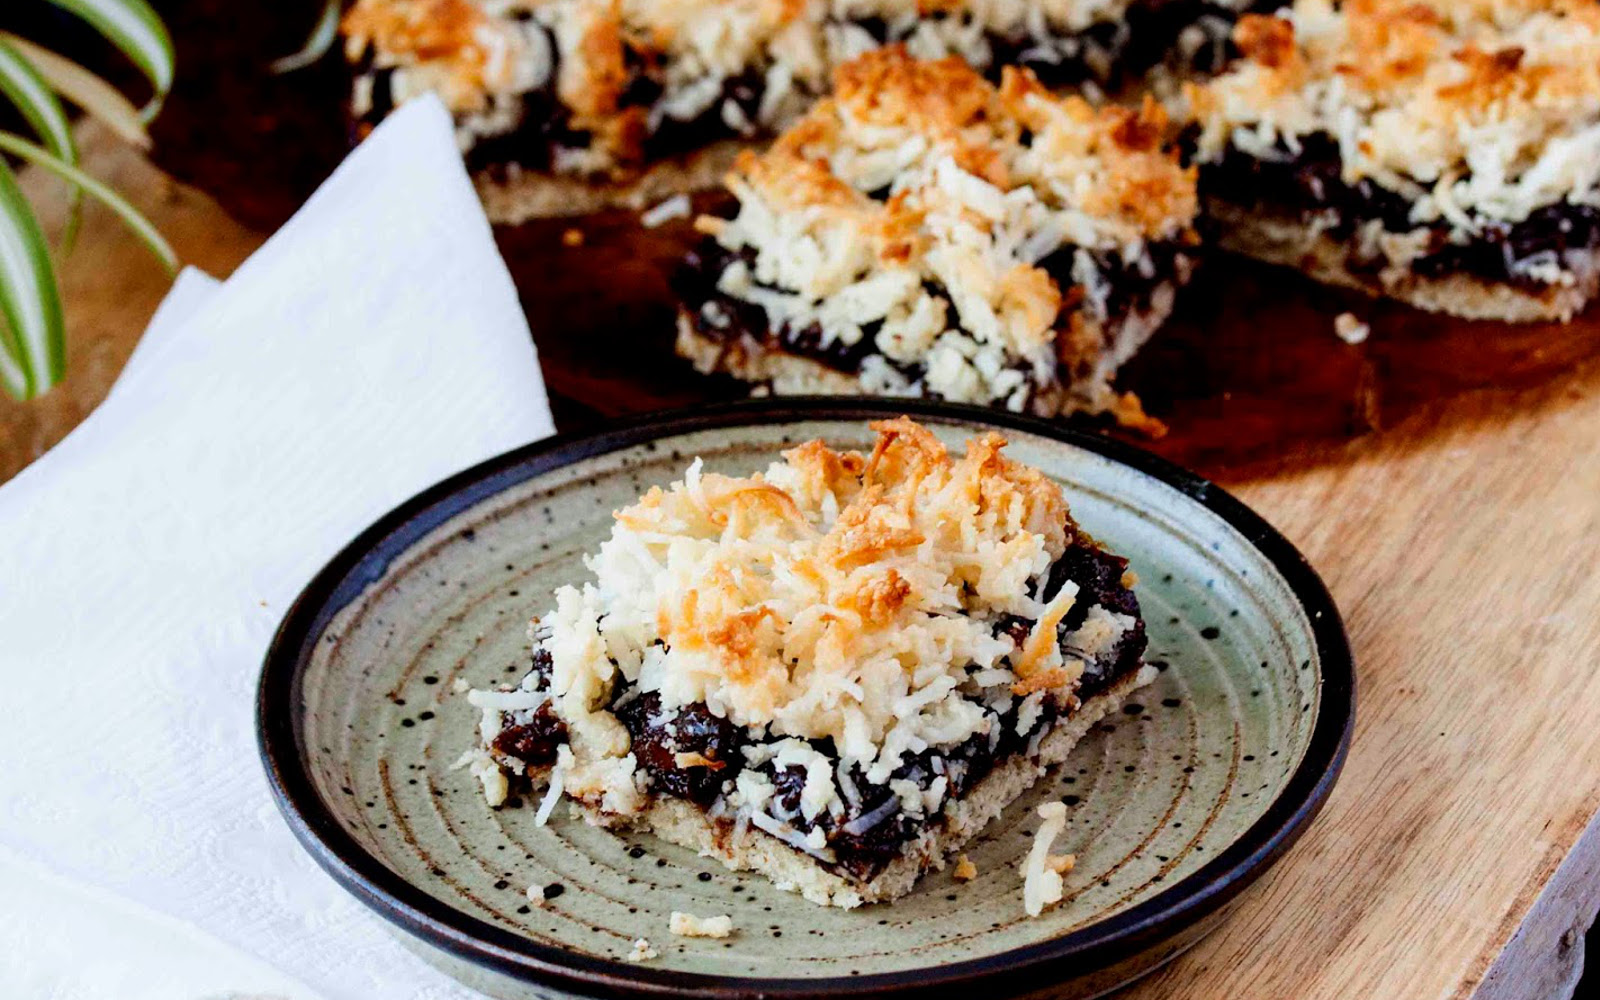 Paleo Blueberry Coconut Slice